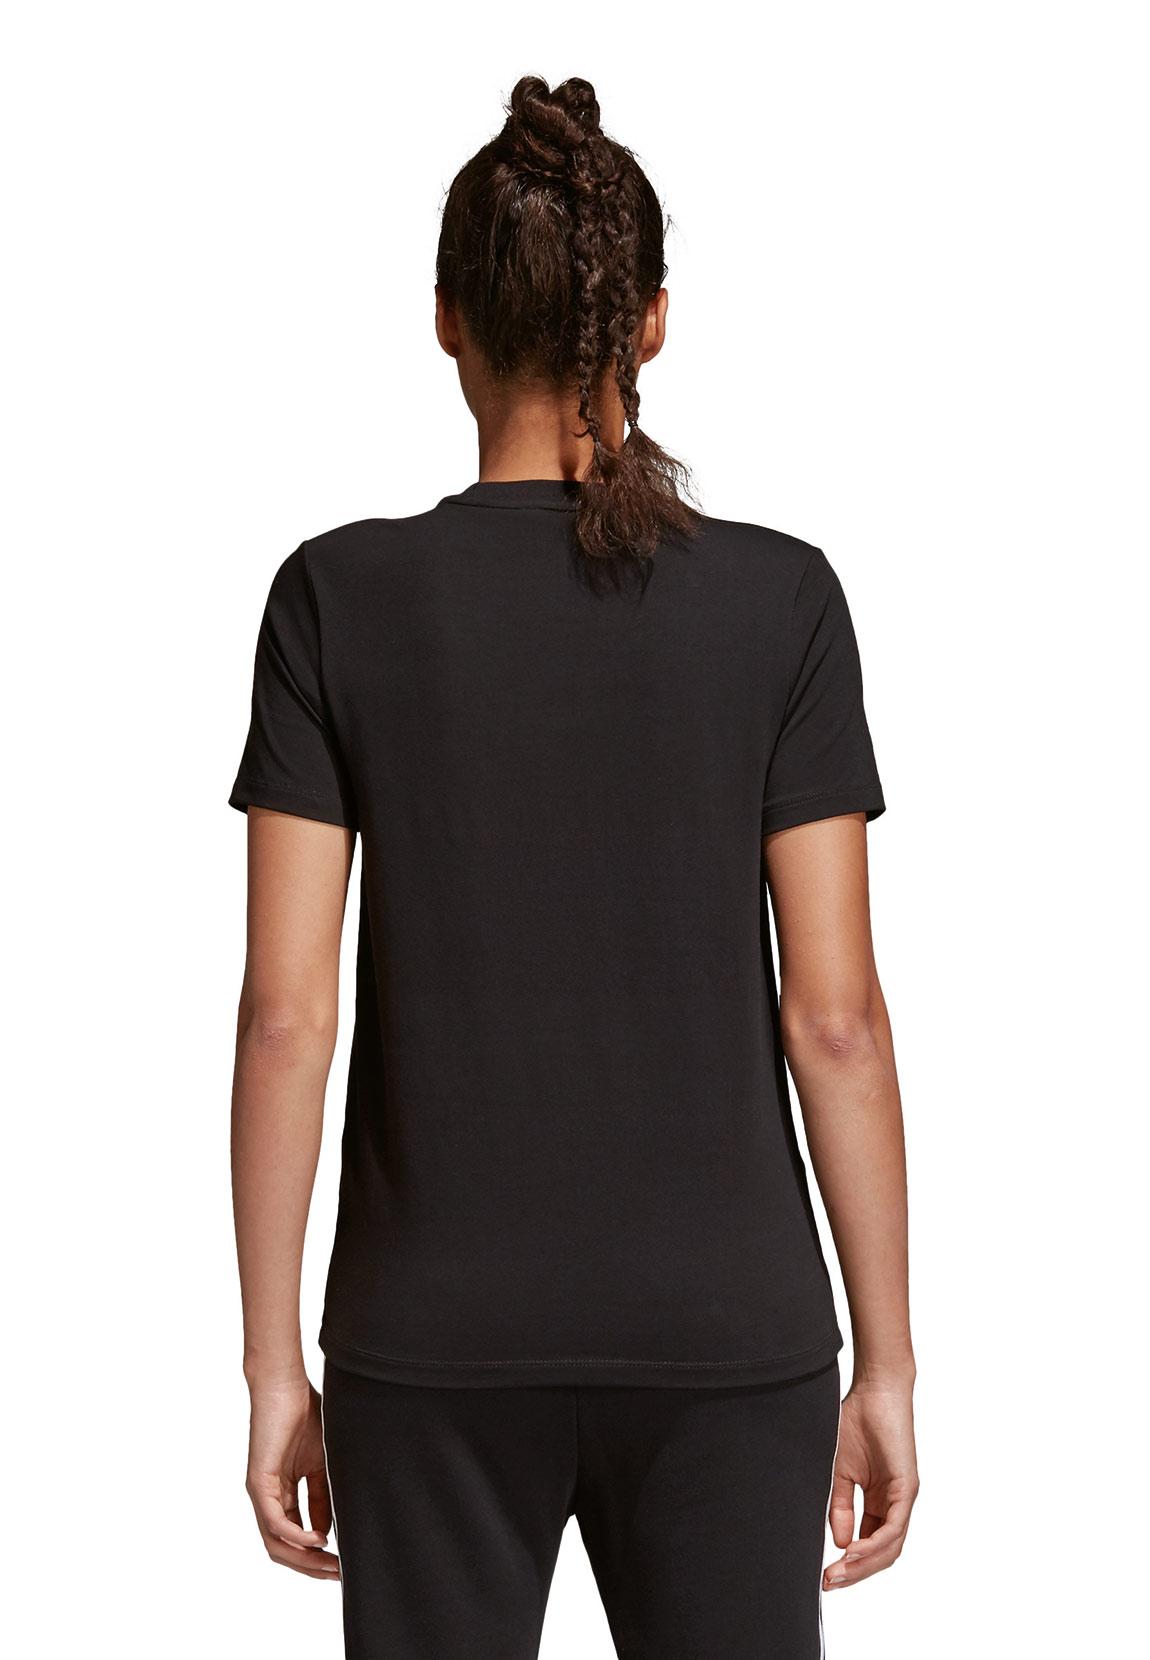 adidas originals damen t shirt trefoil tee cv9888 schwarz damen t shirt polos. Black Bedroom Furniture Sets. Home Design Ideas